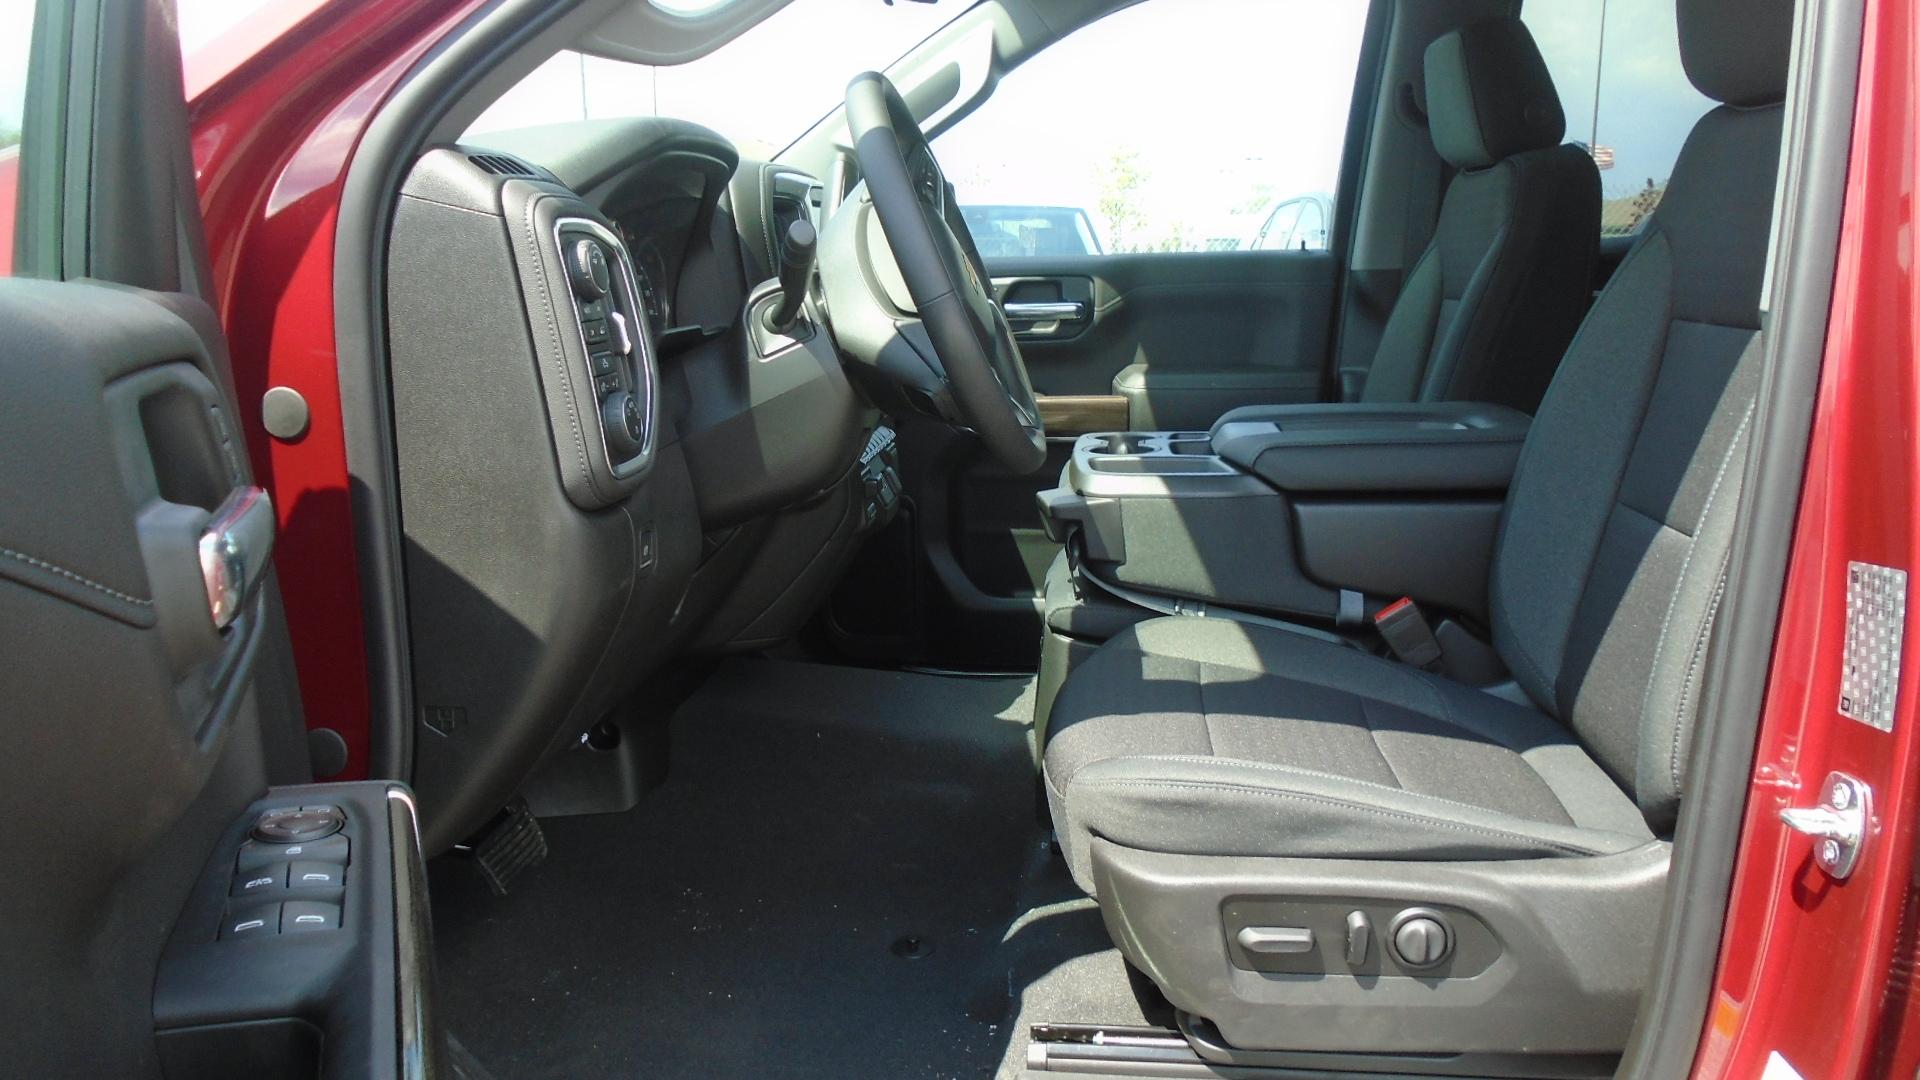 2019 Silverado 1500 Double Cab 4x4,  Pickup #82680 - photo 3